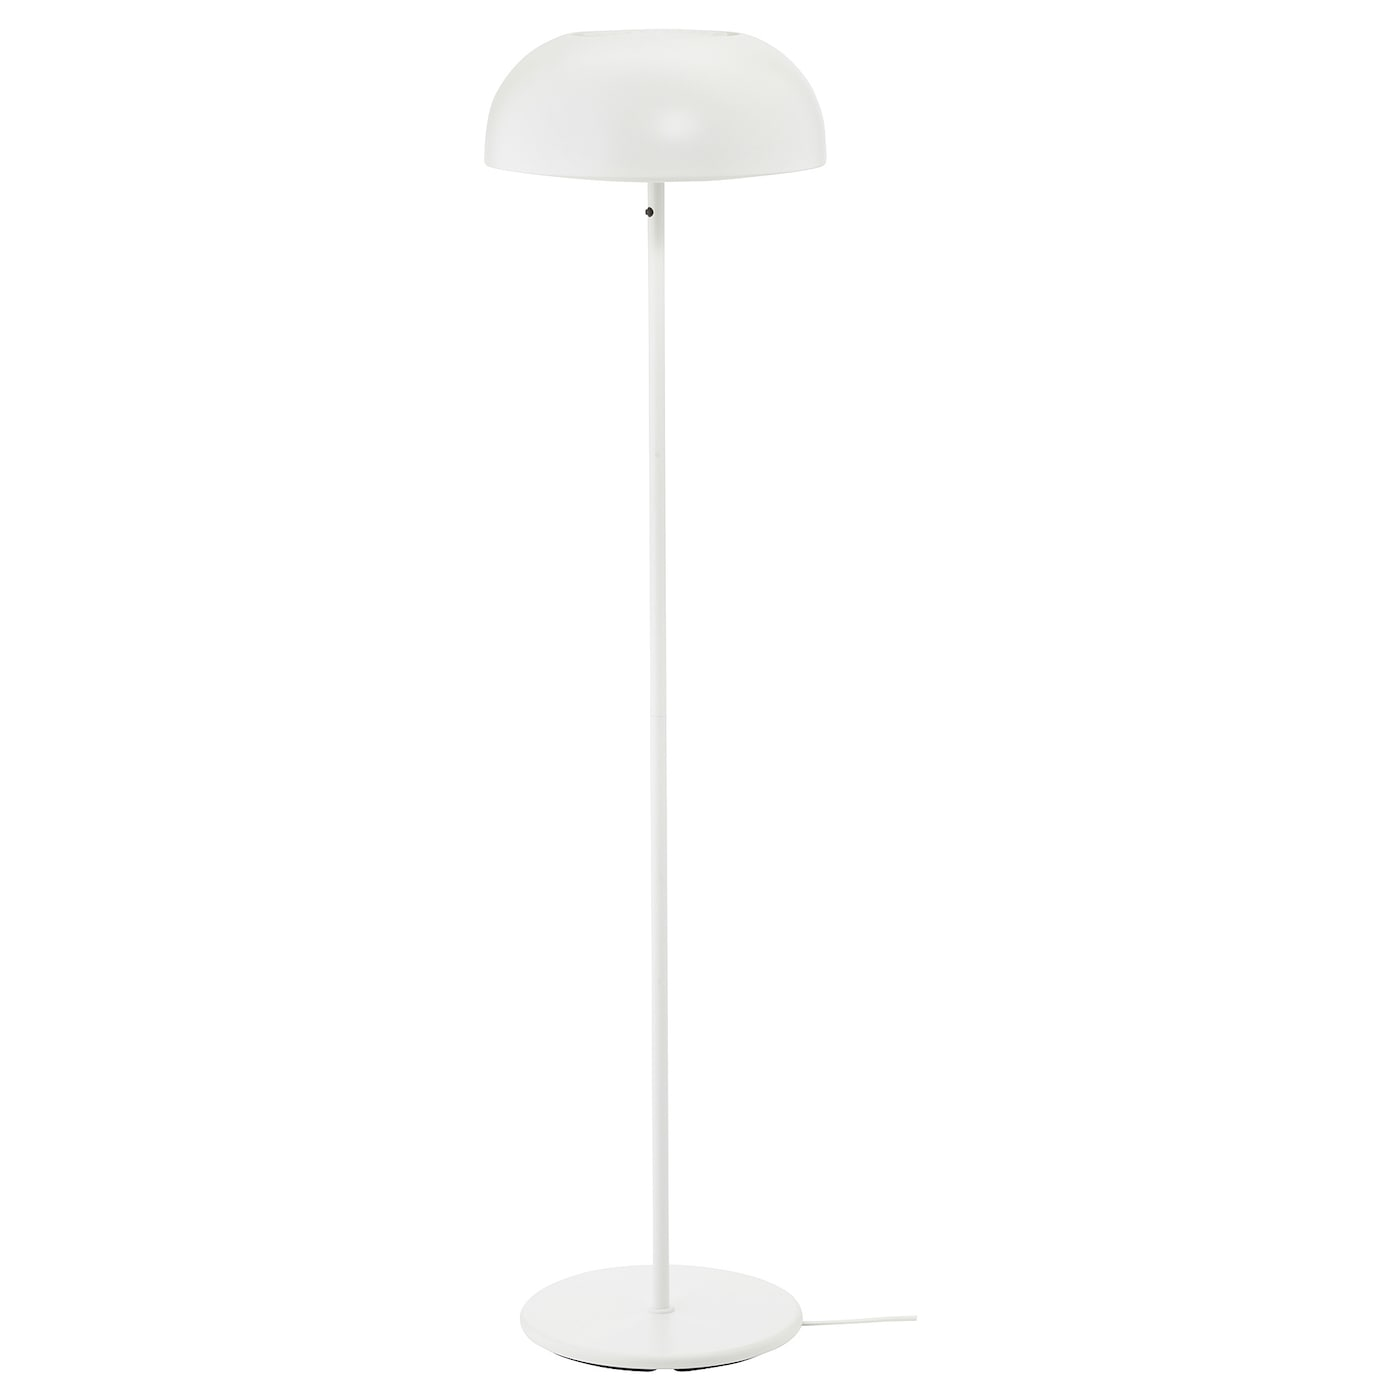 Ikea Standleuchten Online Kaufen Mobel Suchmaschine Ladendirekt De